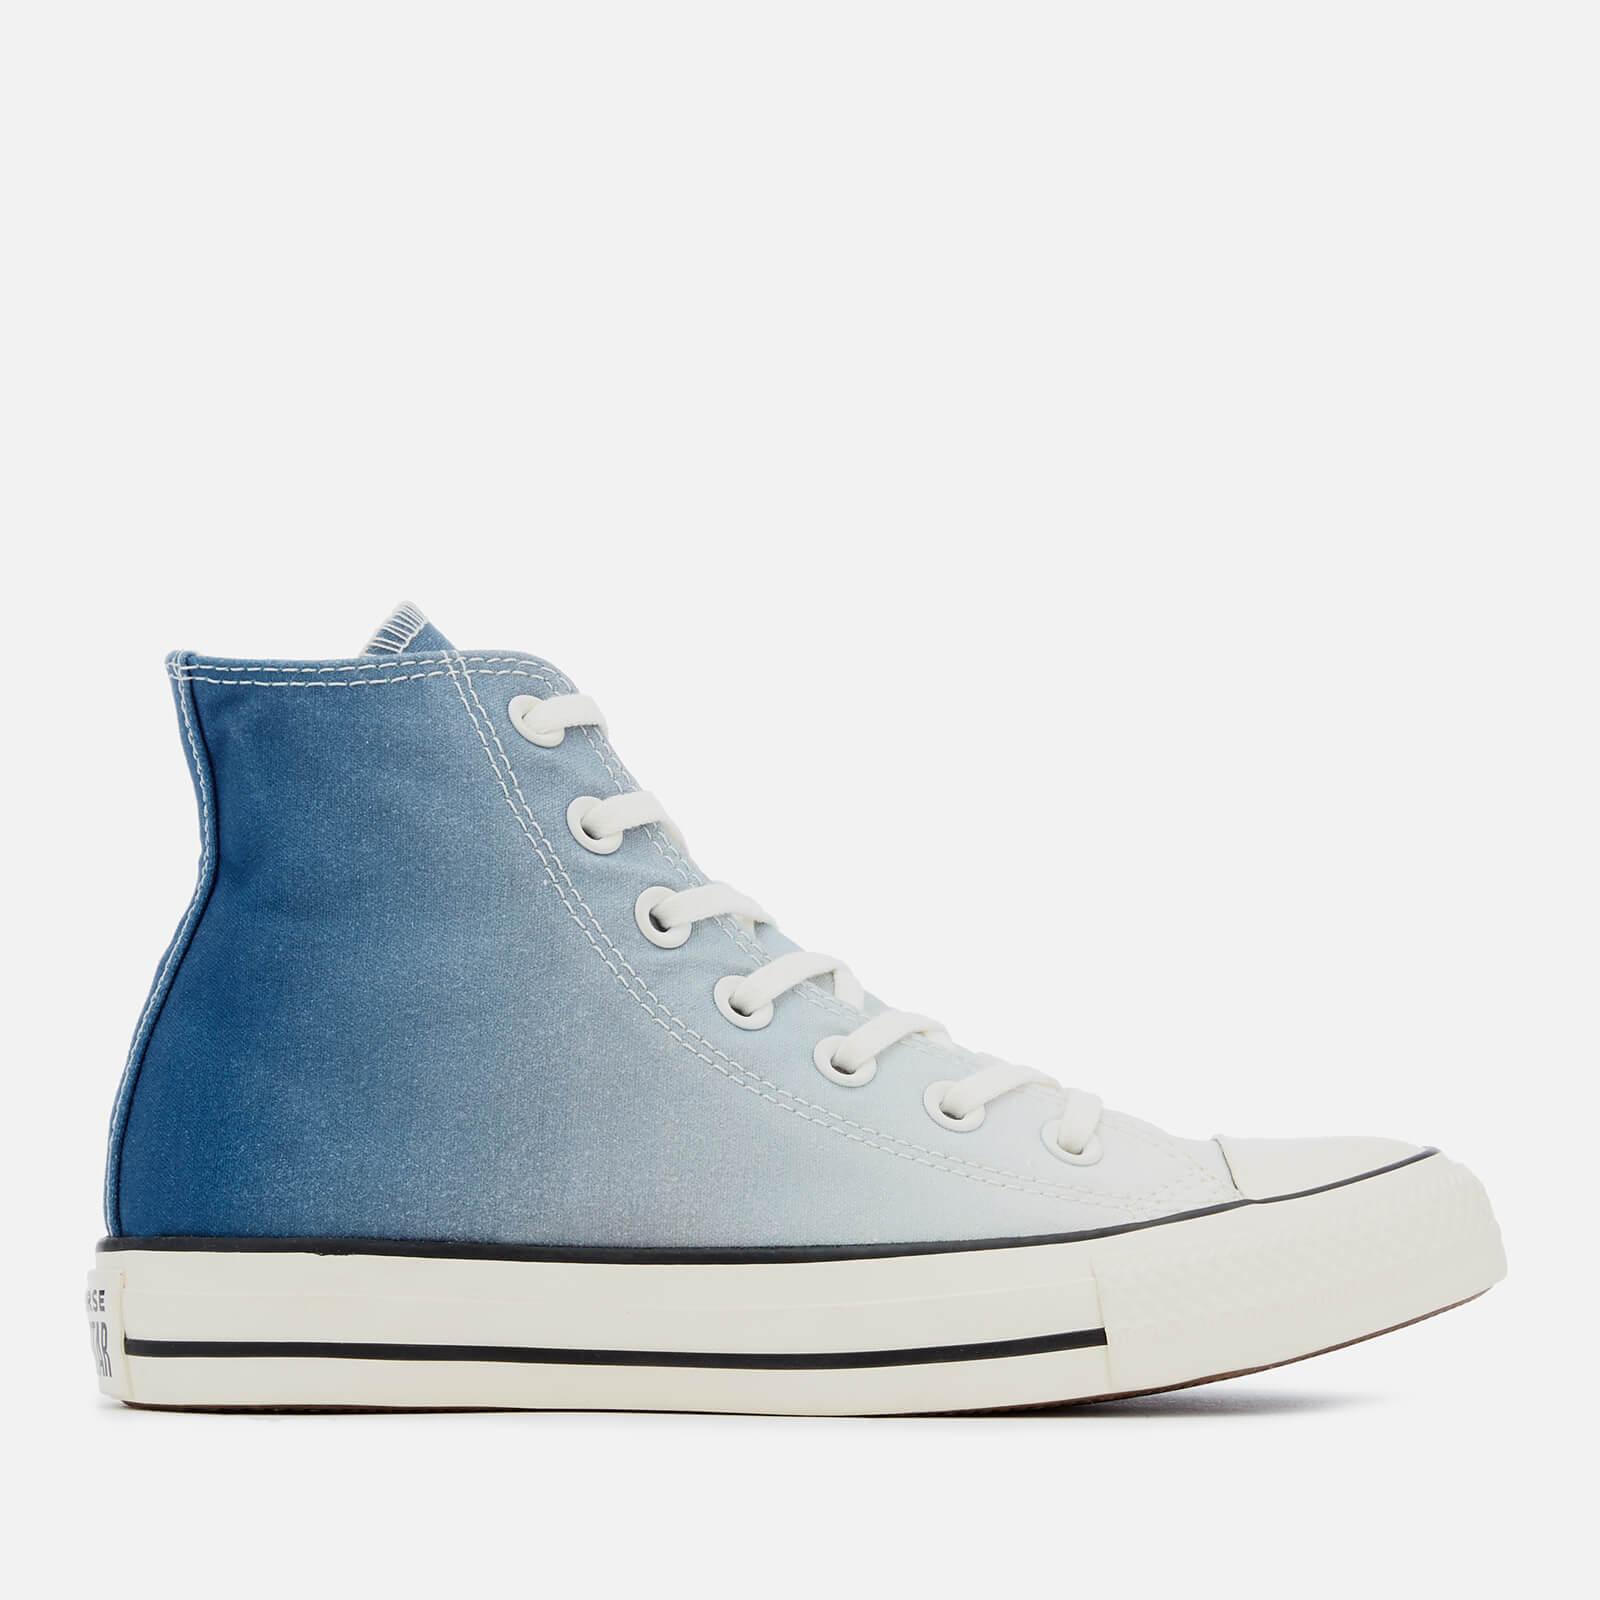 b08f6ebf41bd57 Converse Women s Chuck Taylor All Star Hi-Top Trainers - Mason Blue Egret  Womens Footwear